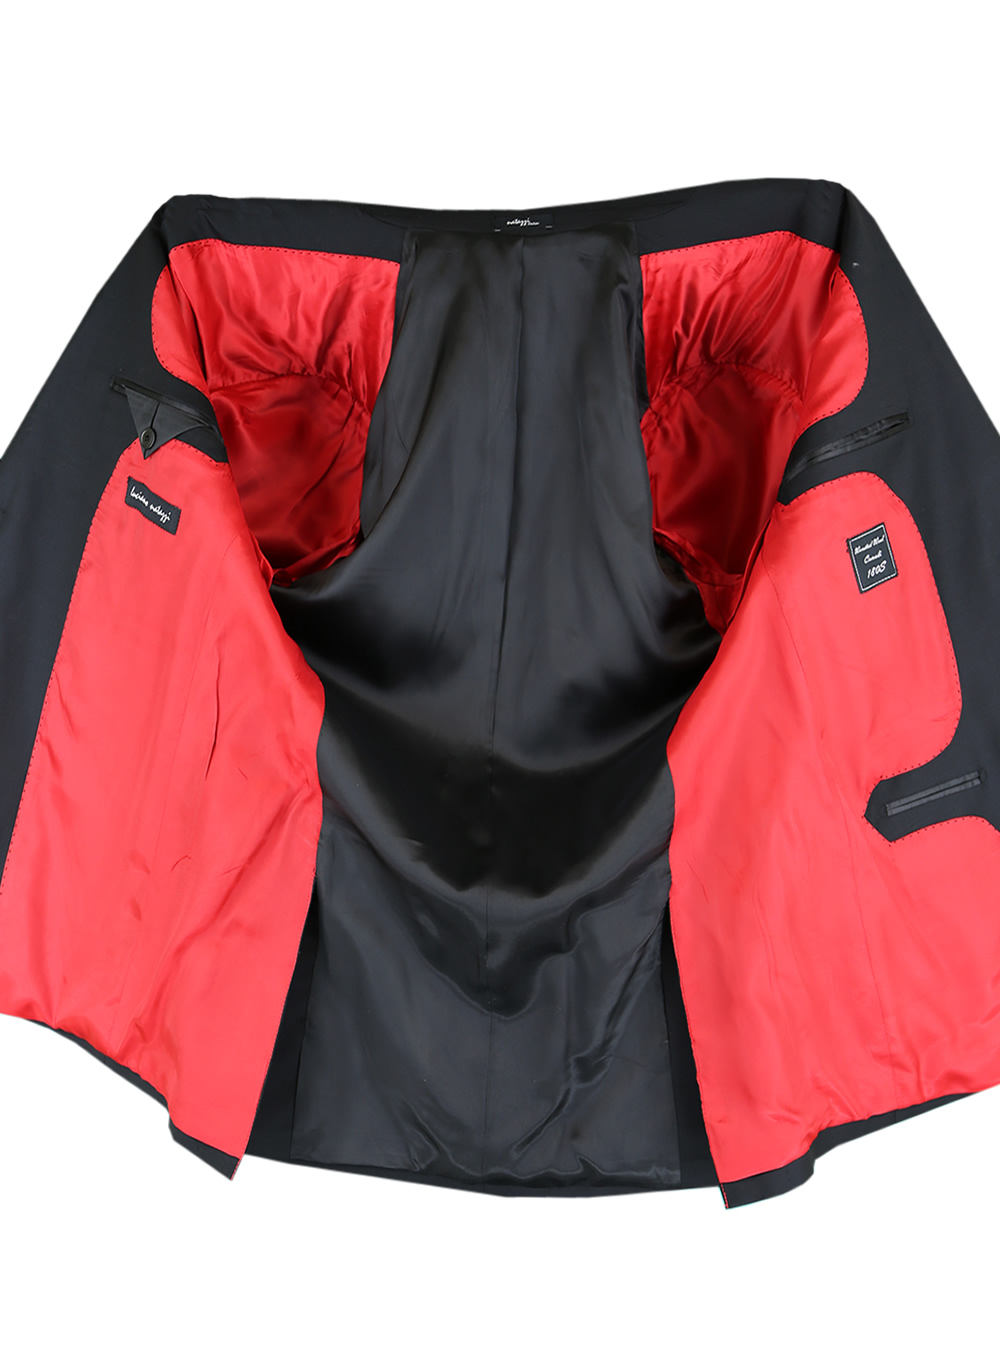 b8b6f5966fe543 LUCIANO NATAZZI Italian Mens Suit 180S Cashmere Wool Ticket Pocket ...